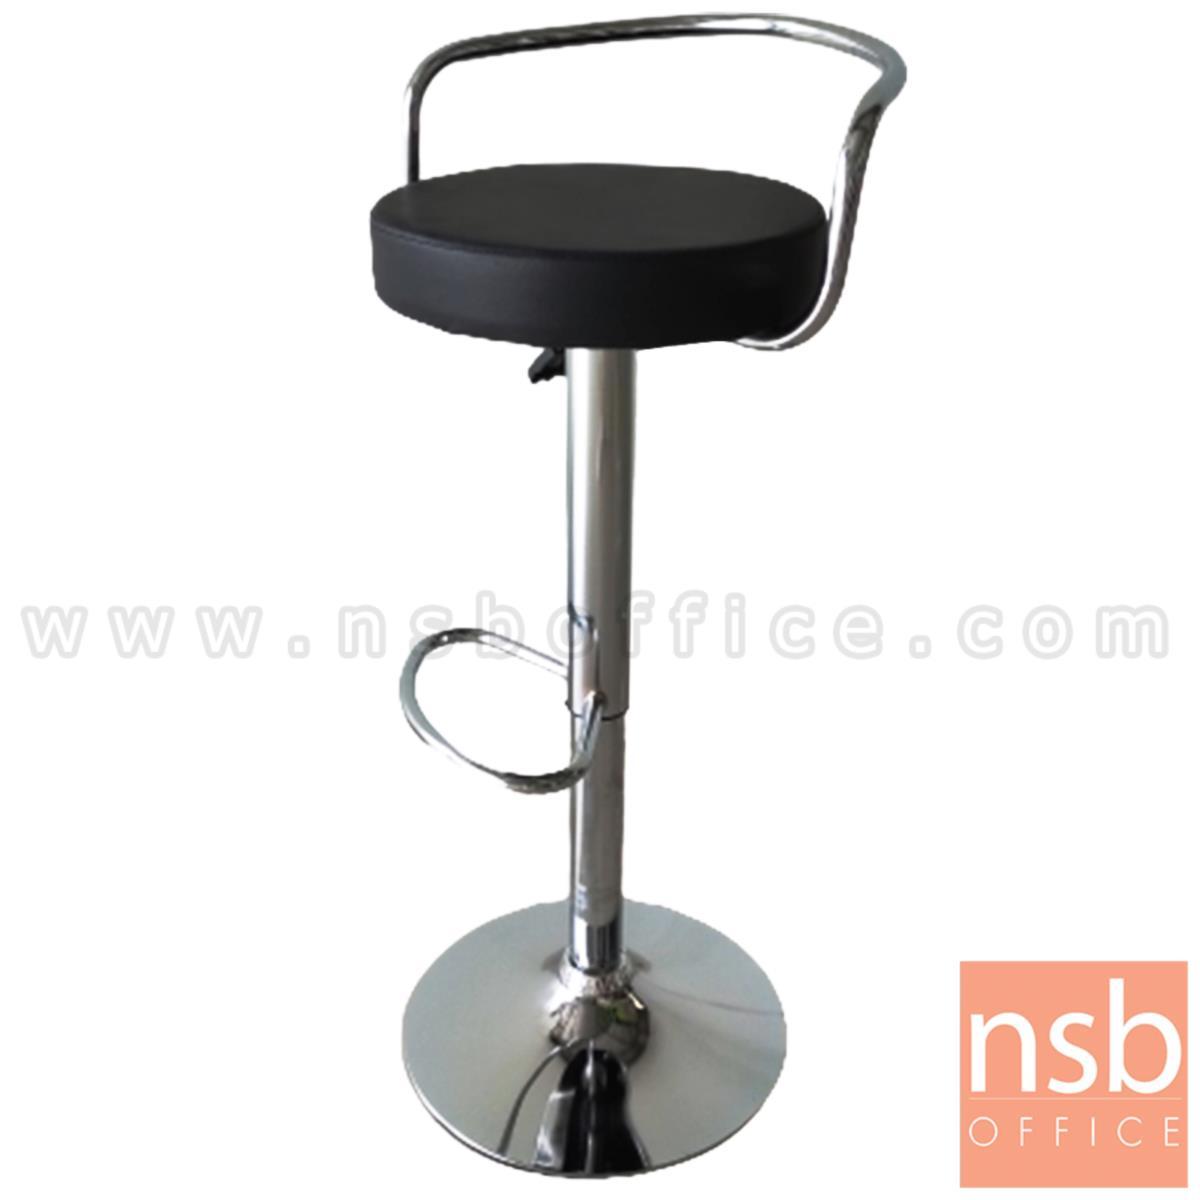 B09A224:เก้าอี้บาร์สตูลที่นั่งกลม รุ่น Flechette (เฟรเชท)  ขาเหล็กชุบโครเมี่ยม